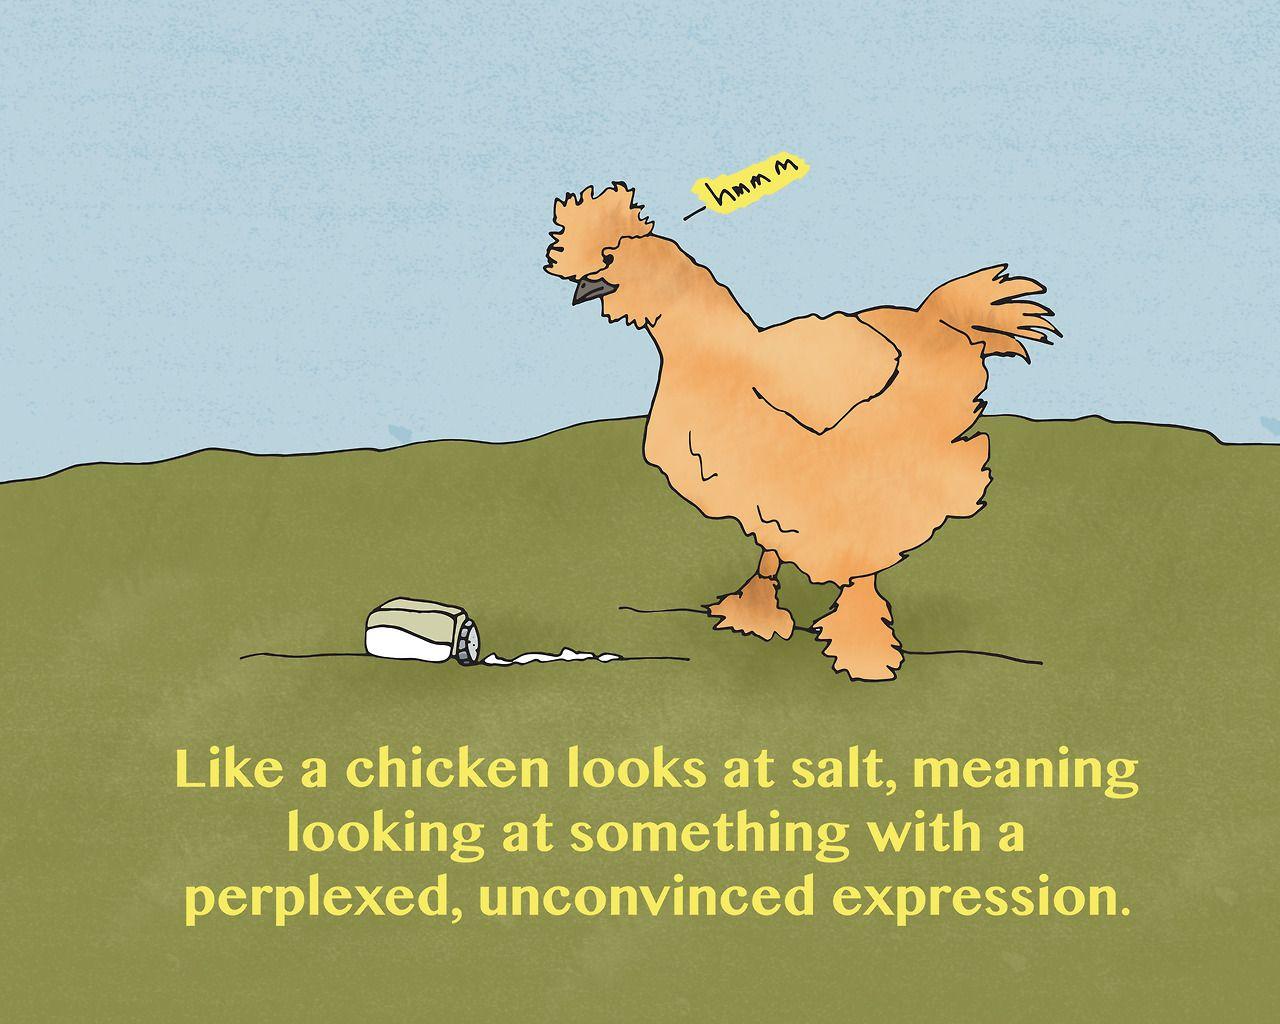 Cómo gallina mira sal.